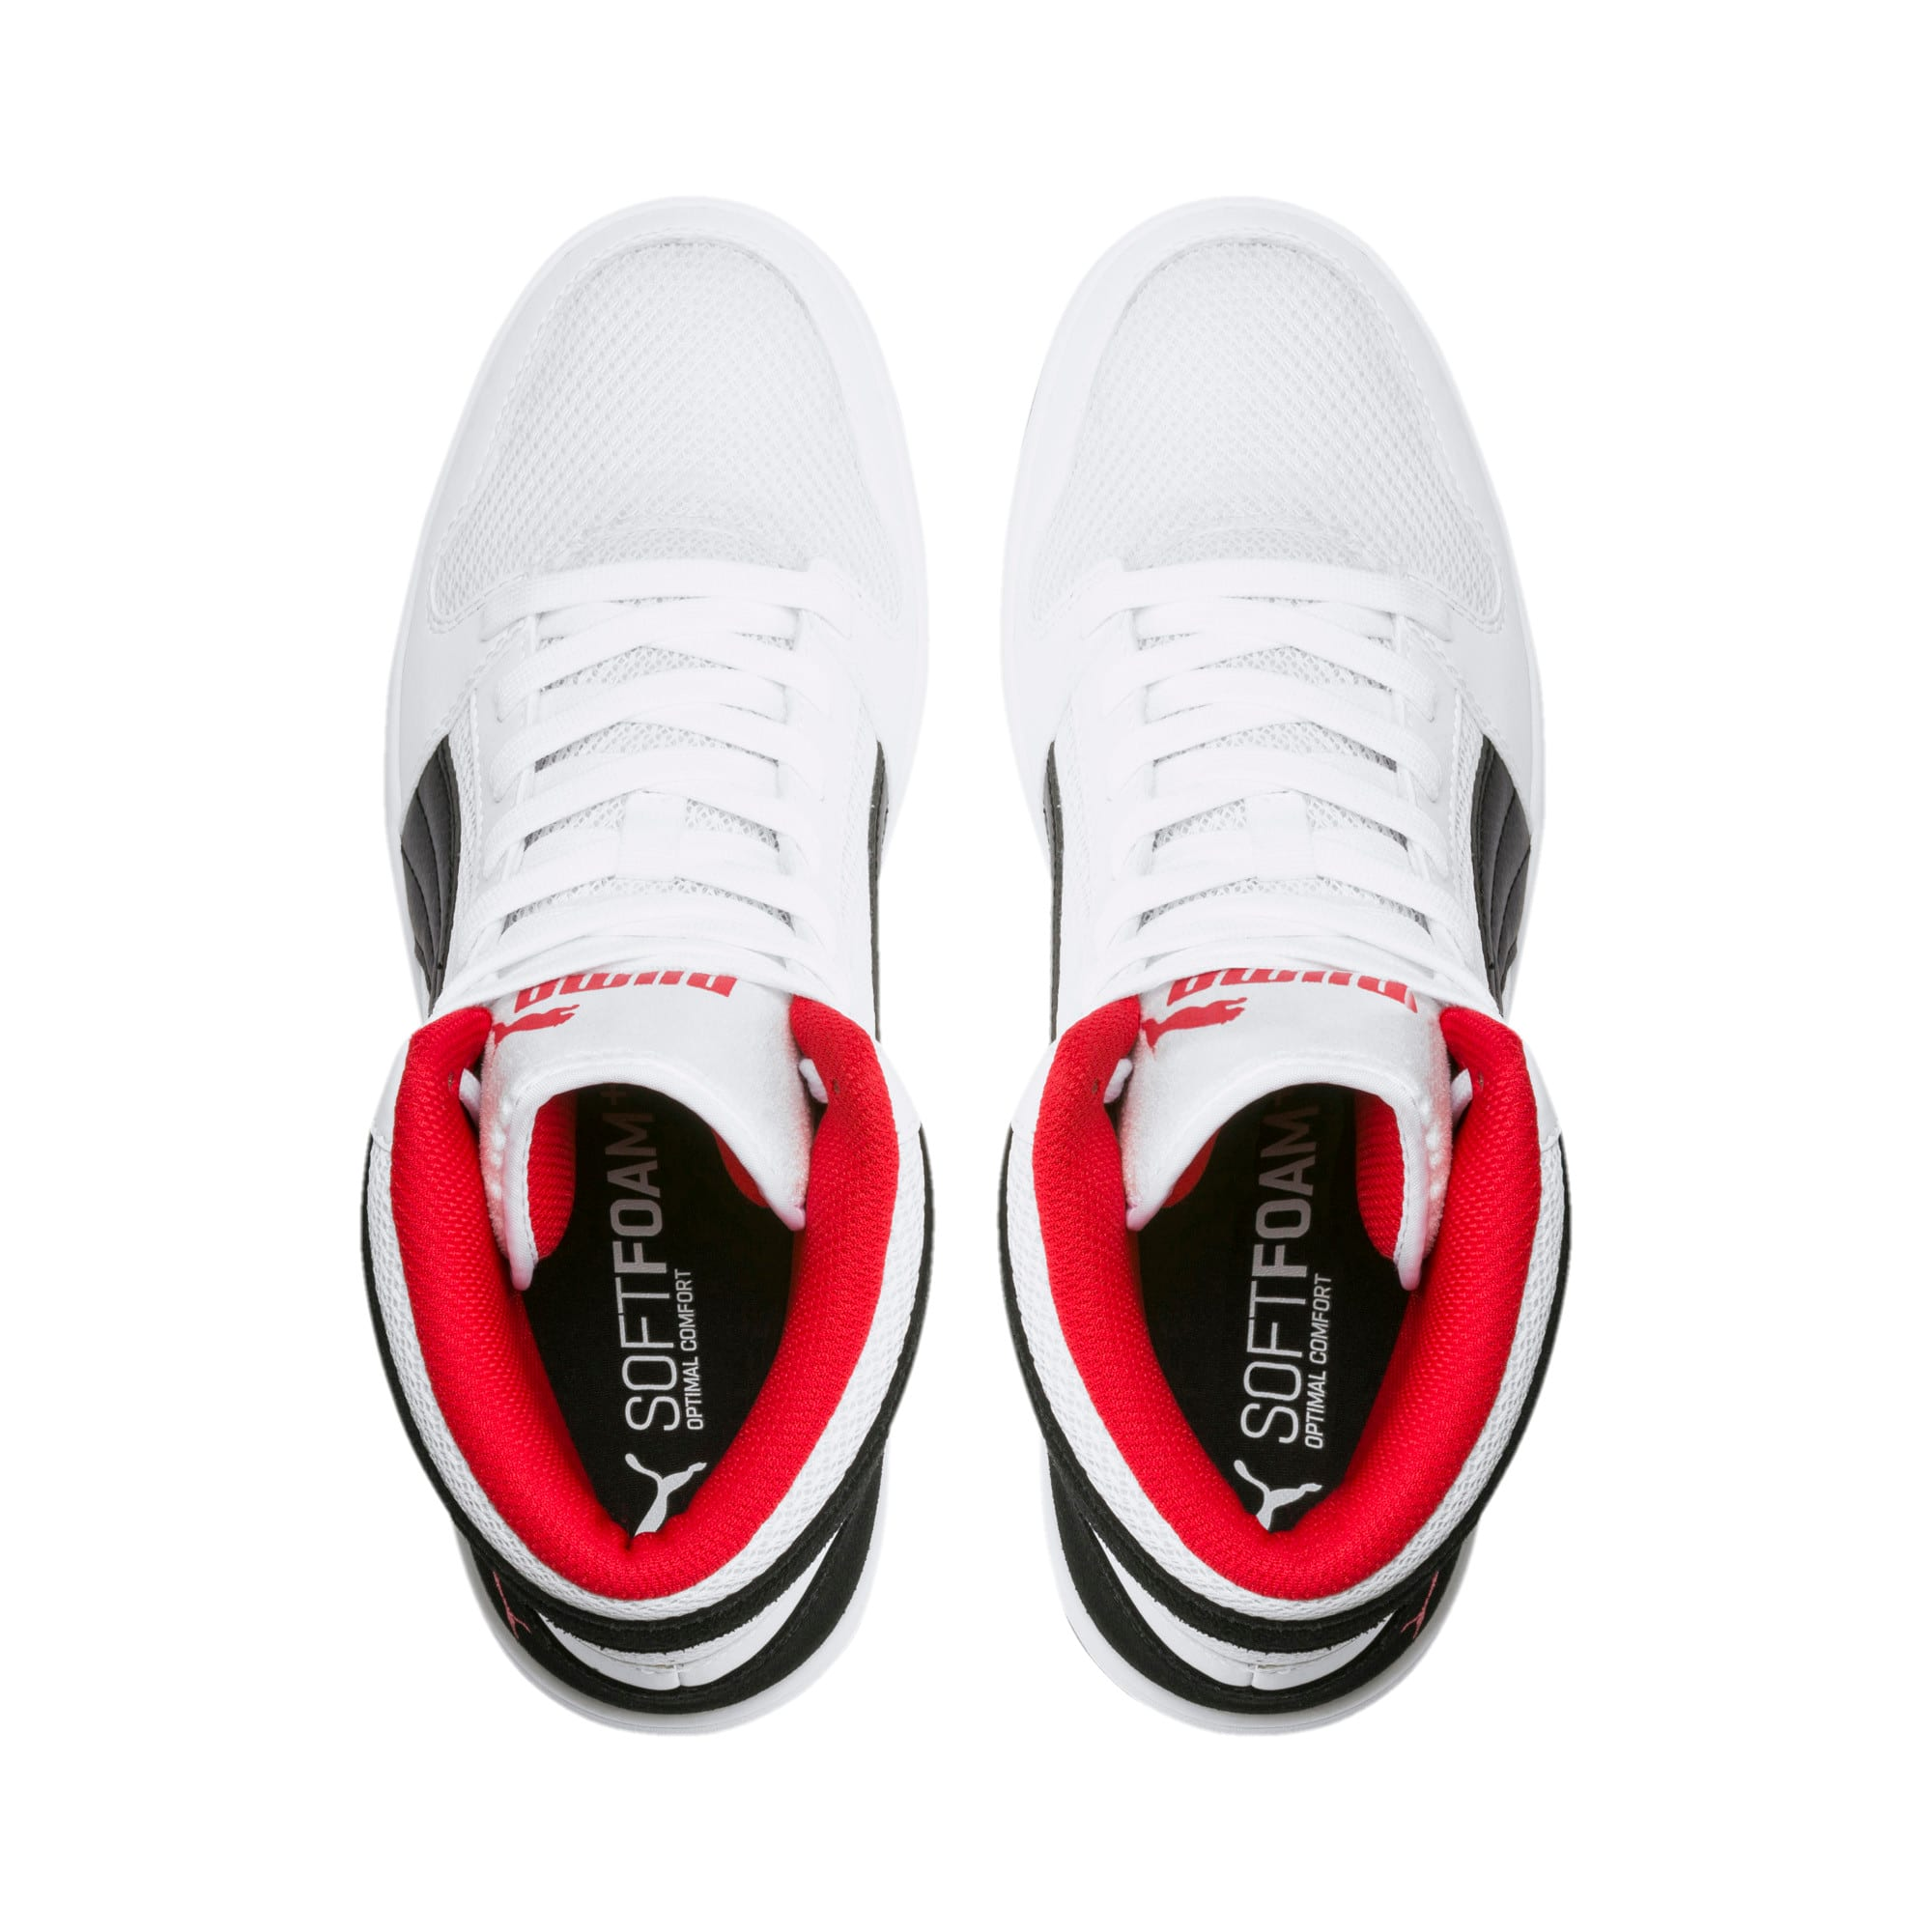 Thumbnail 6 of PUMA Rebound LayUp Mesh Sneakers, White-Black-High Risk Red, medium